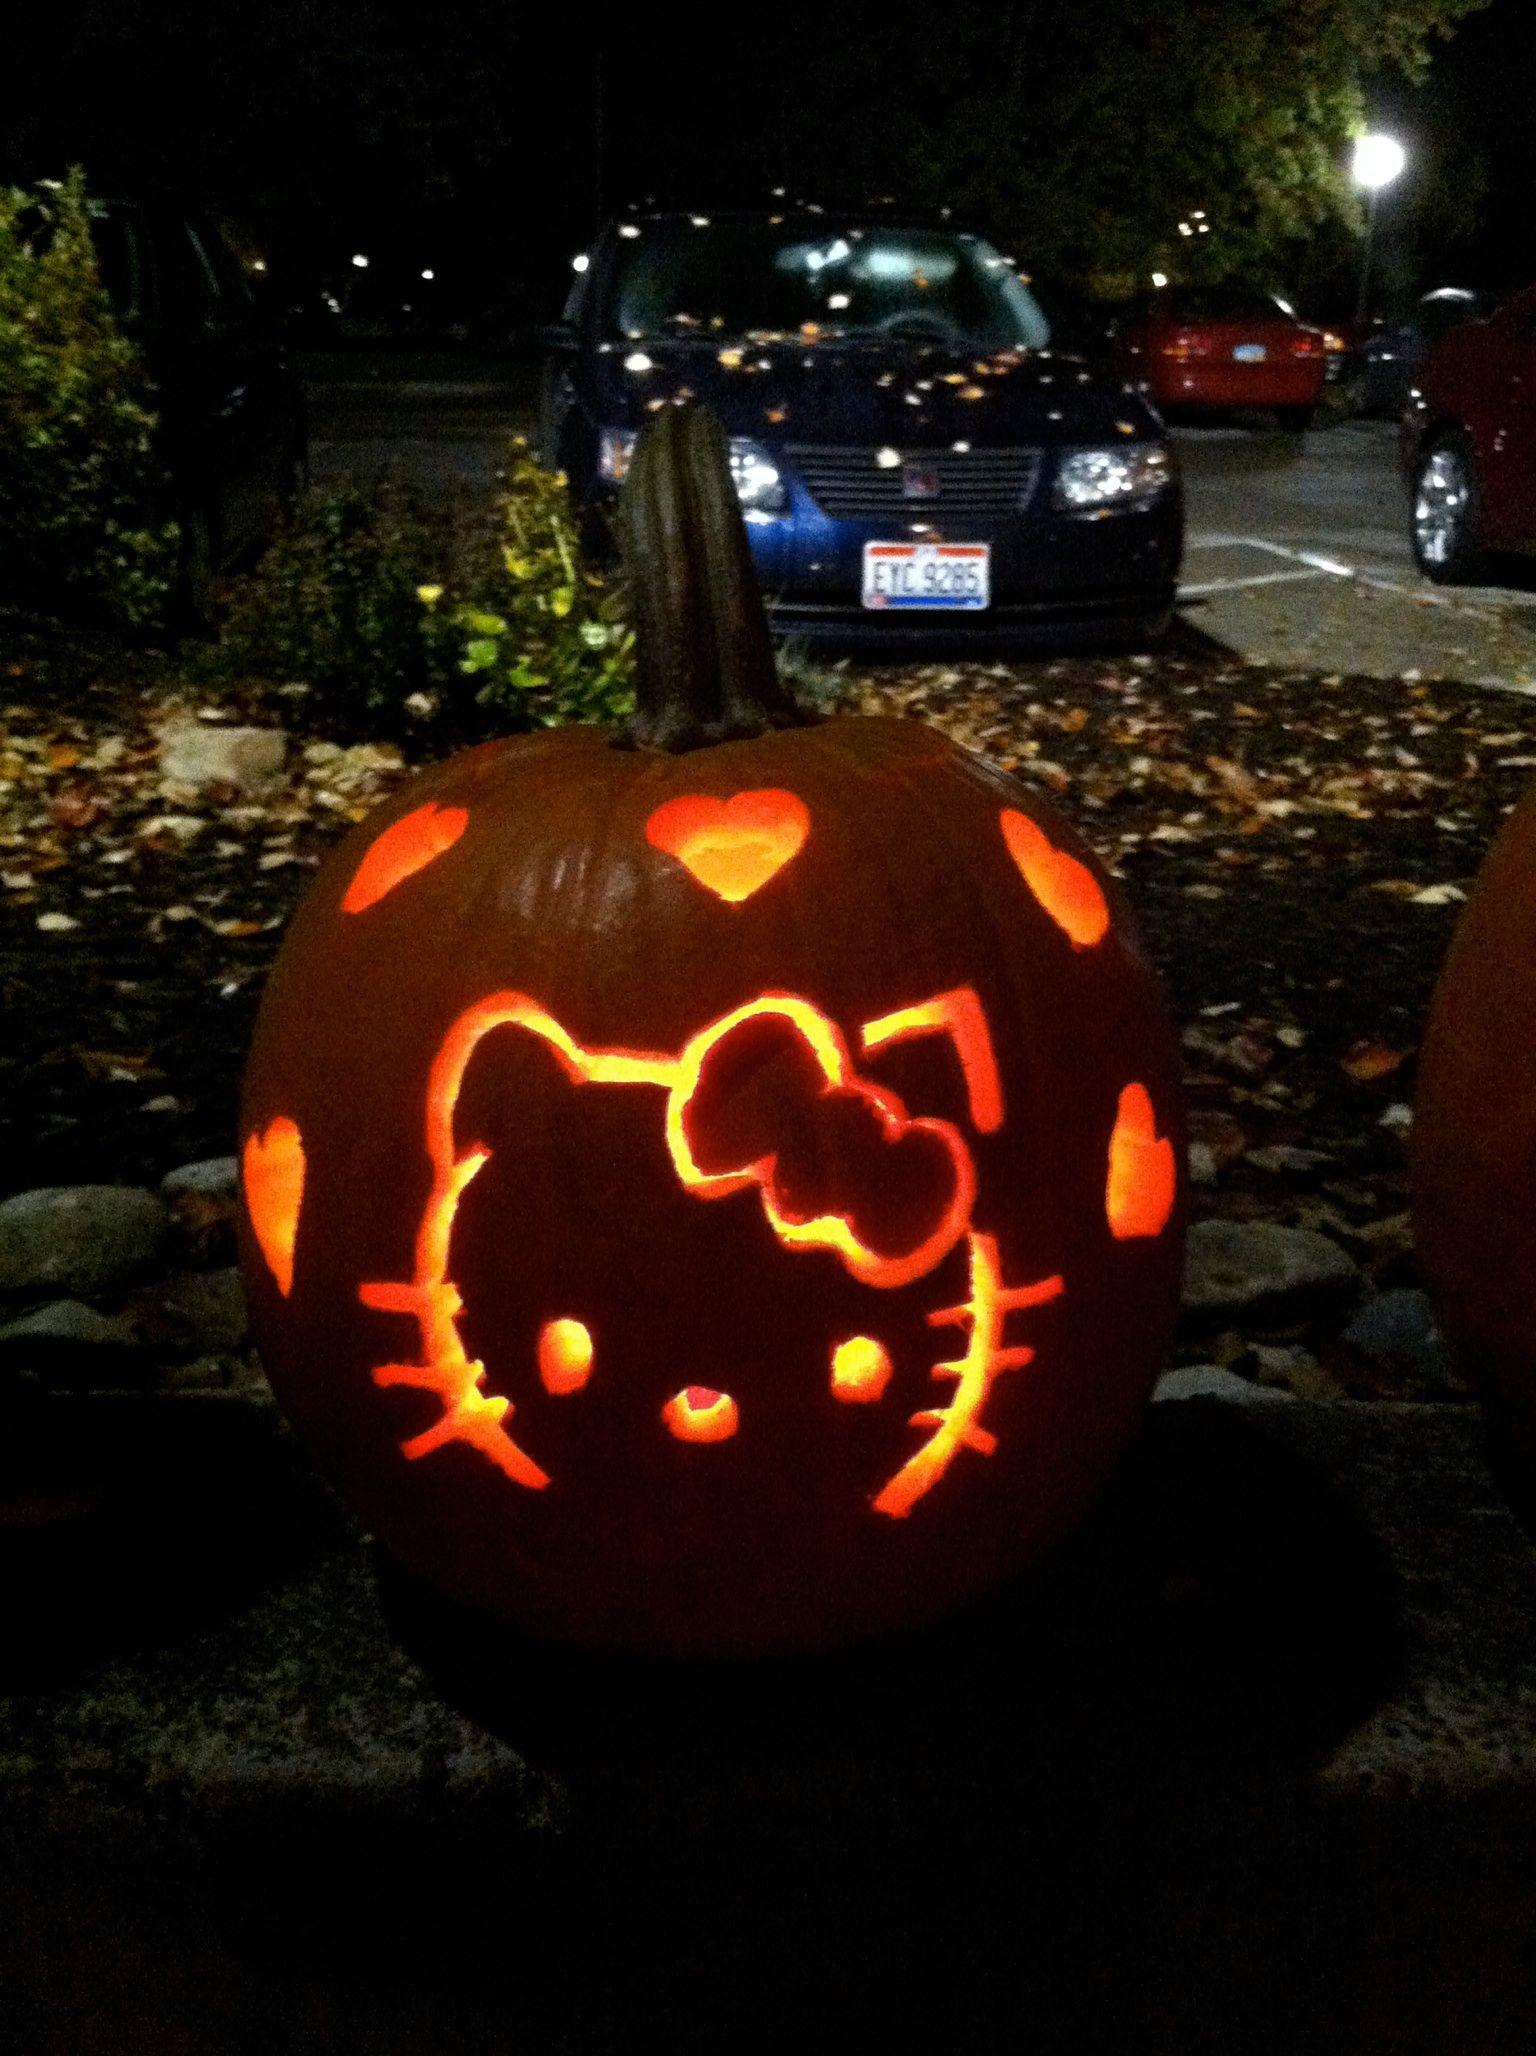 my hello kitty pumpkin holiday hello kitty pumpkin pumpkin rh pinterest com hello kitty pumpkin patch irvine hello kitty pumpkin painting